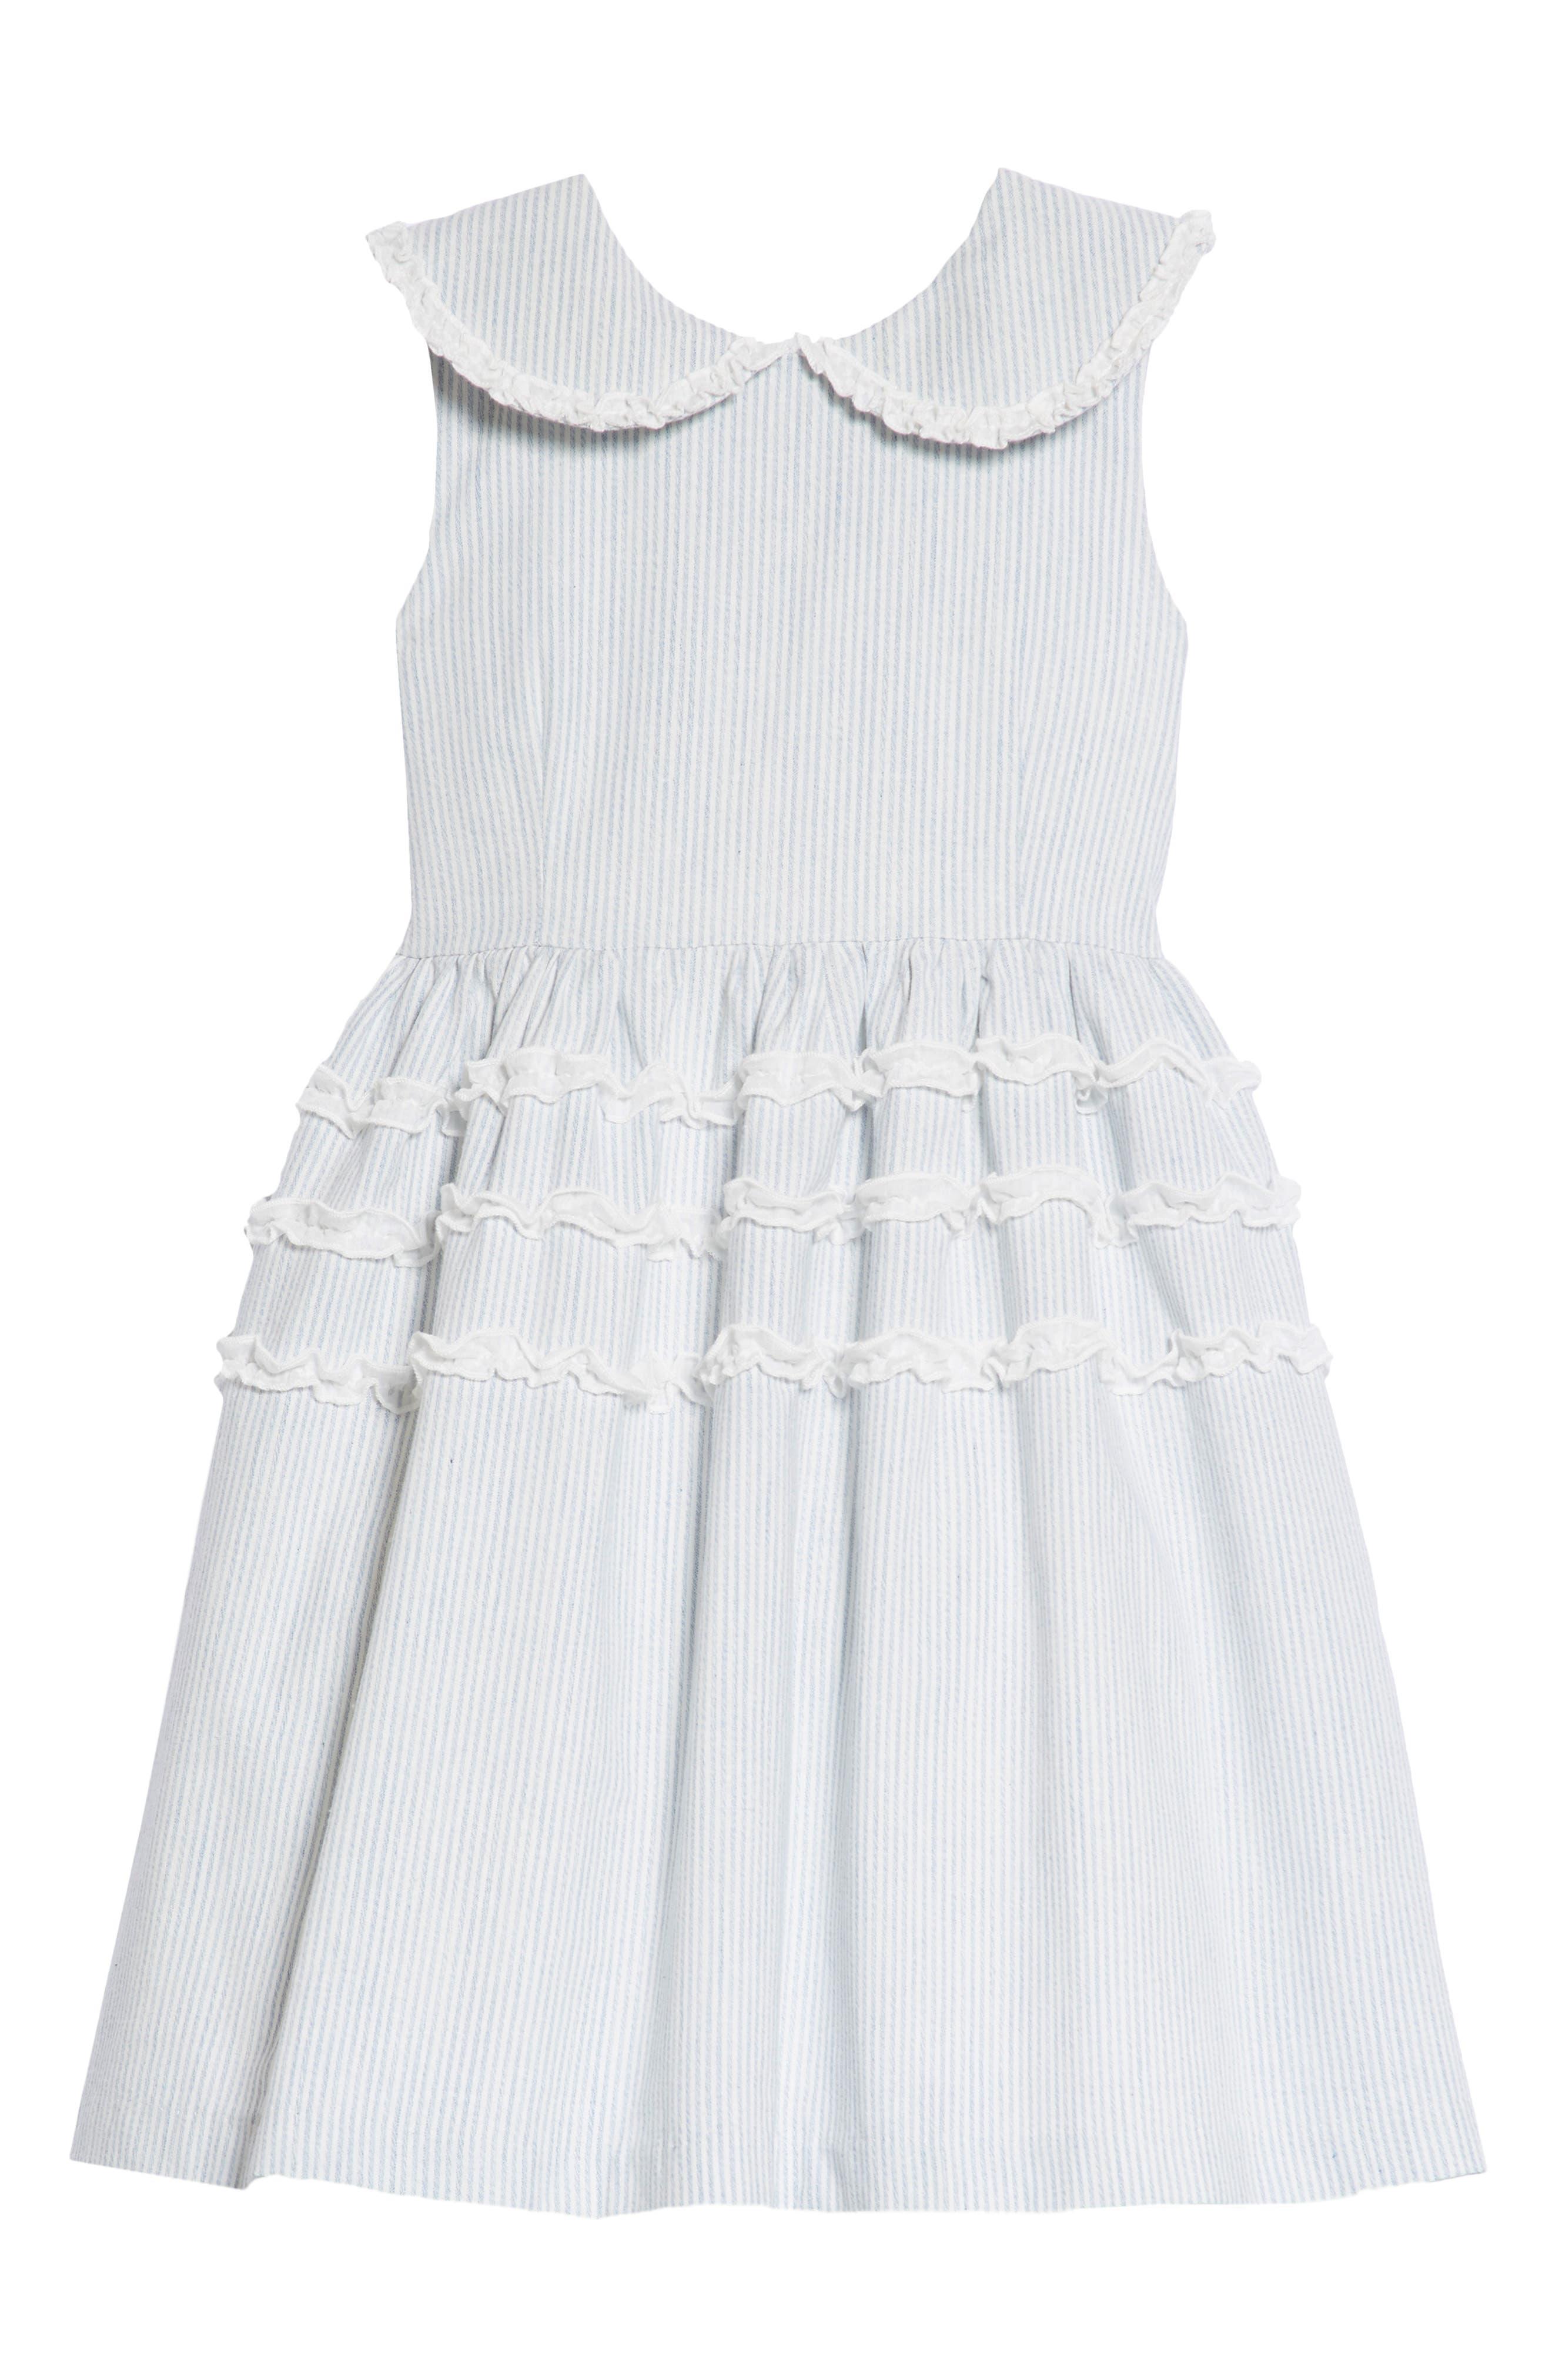 Stripe Ruffle Dress,                             Main thumbnail 1, color,                             402